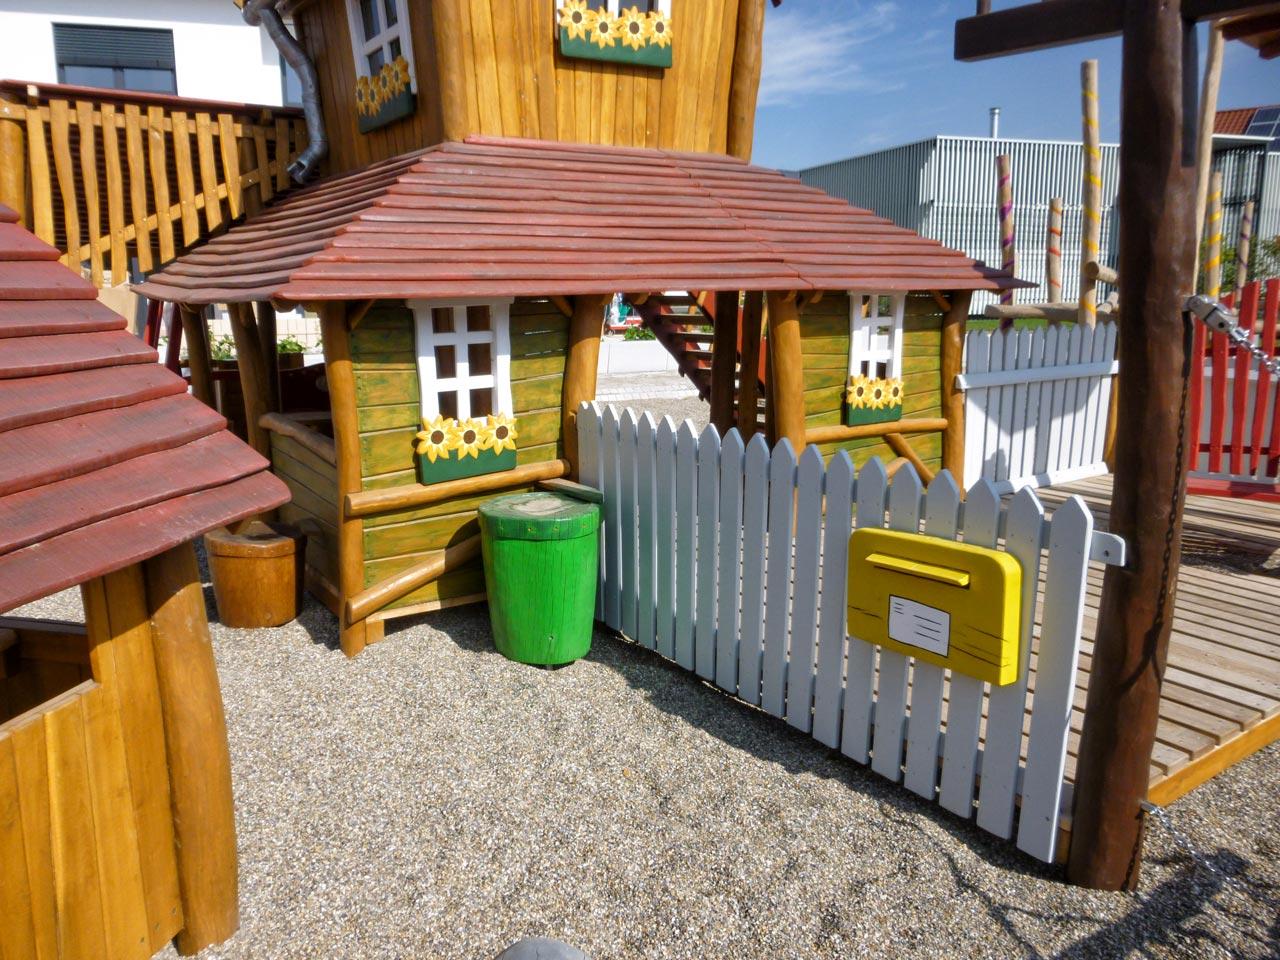 Themenspielplatz, Fertighauswelt, Günzburg